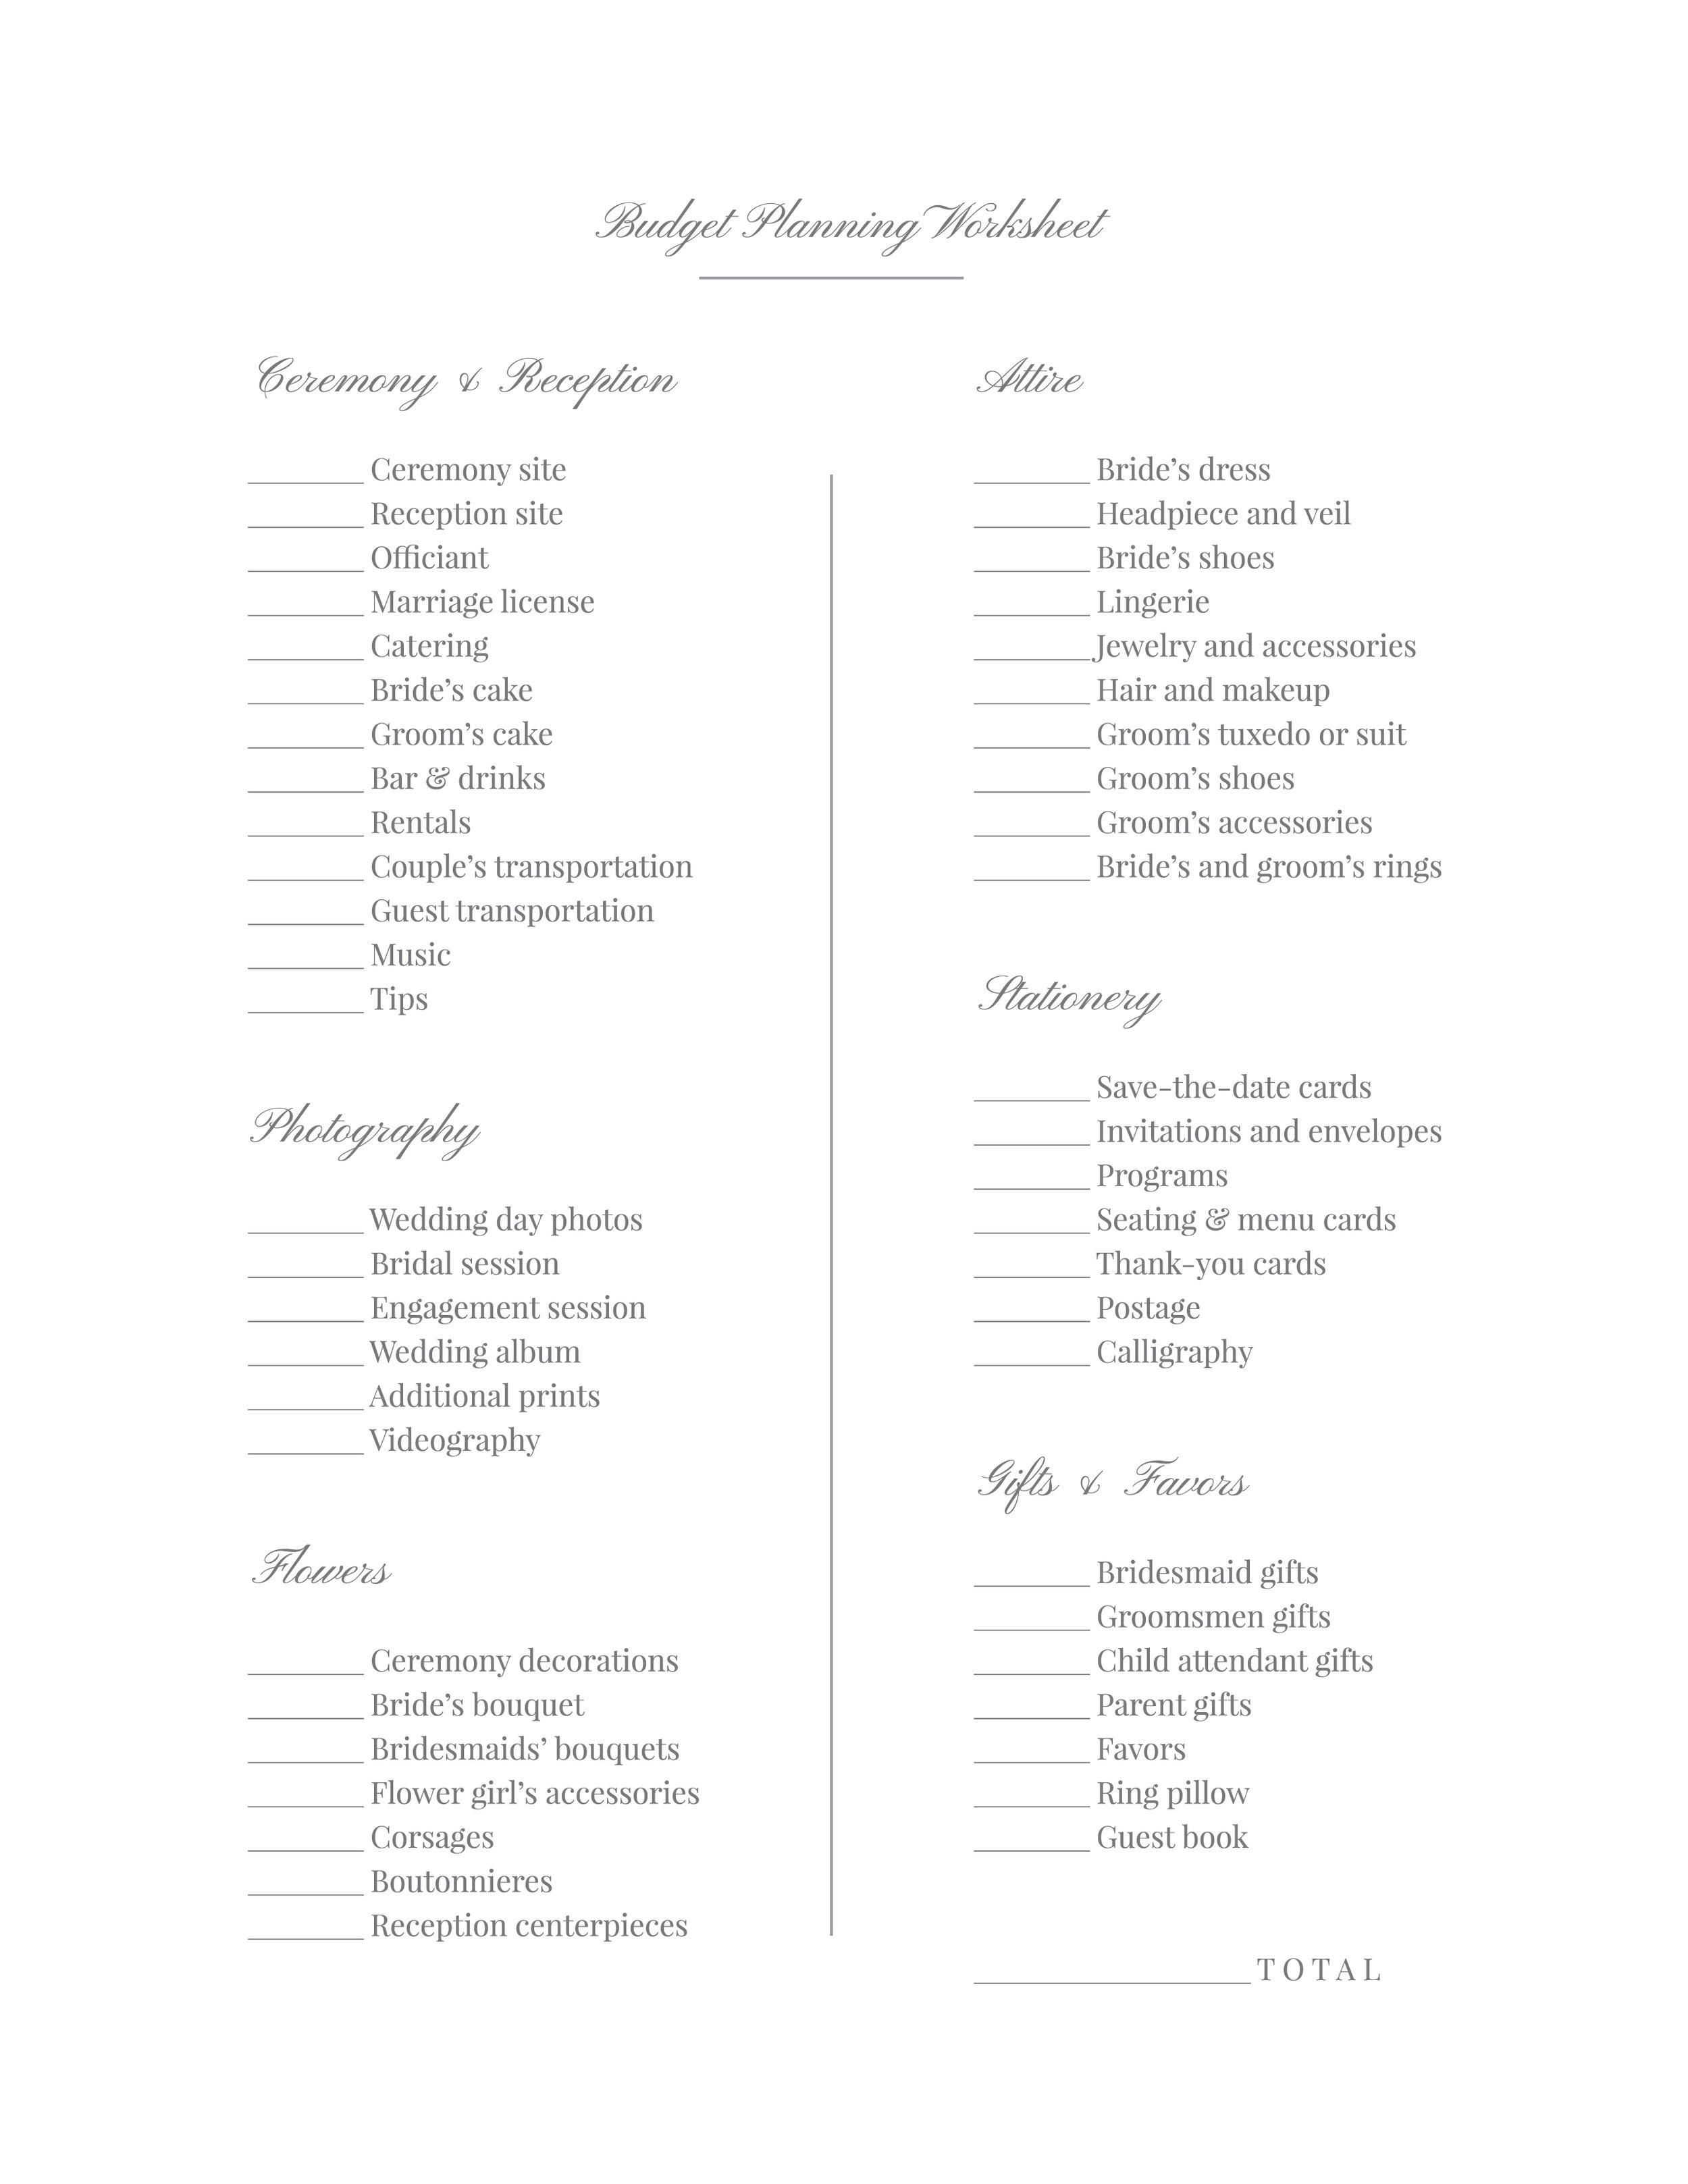 Planning mag_11.2.jpg